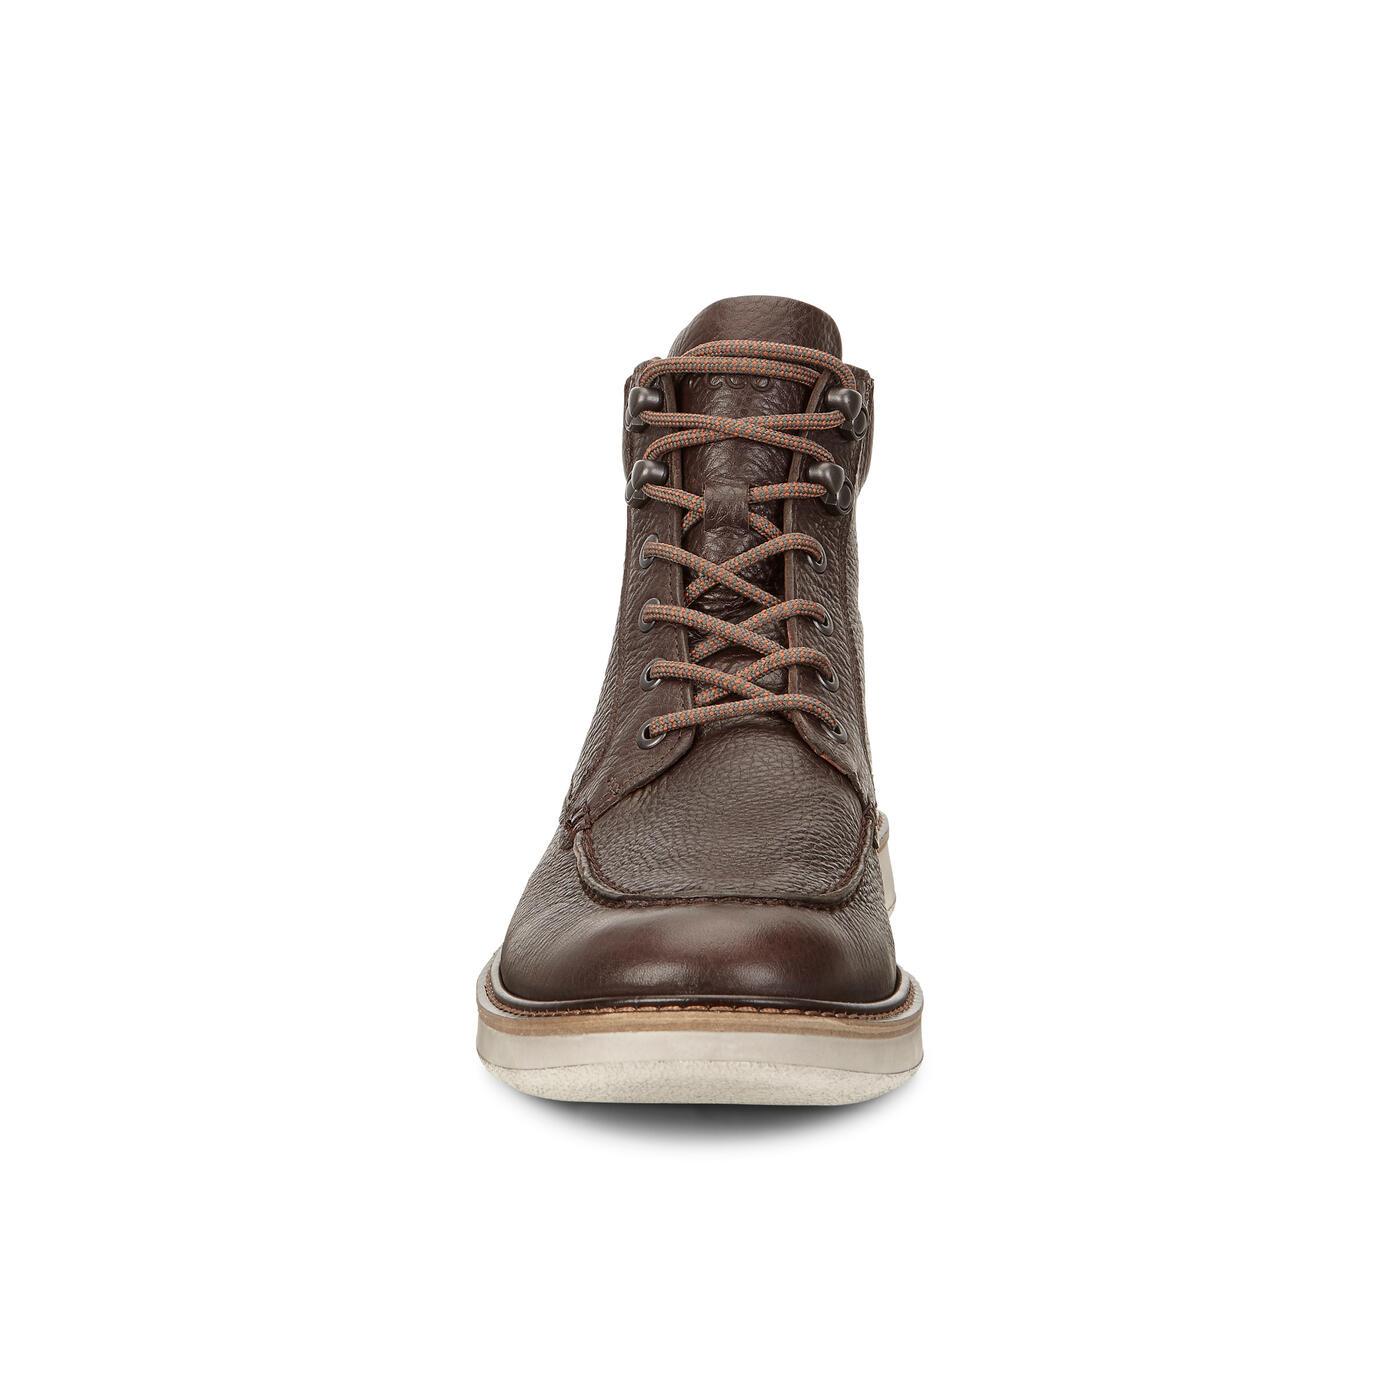 ECCO AURORA Mens Boot